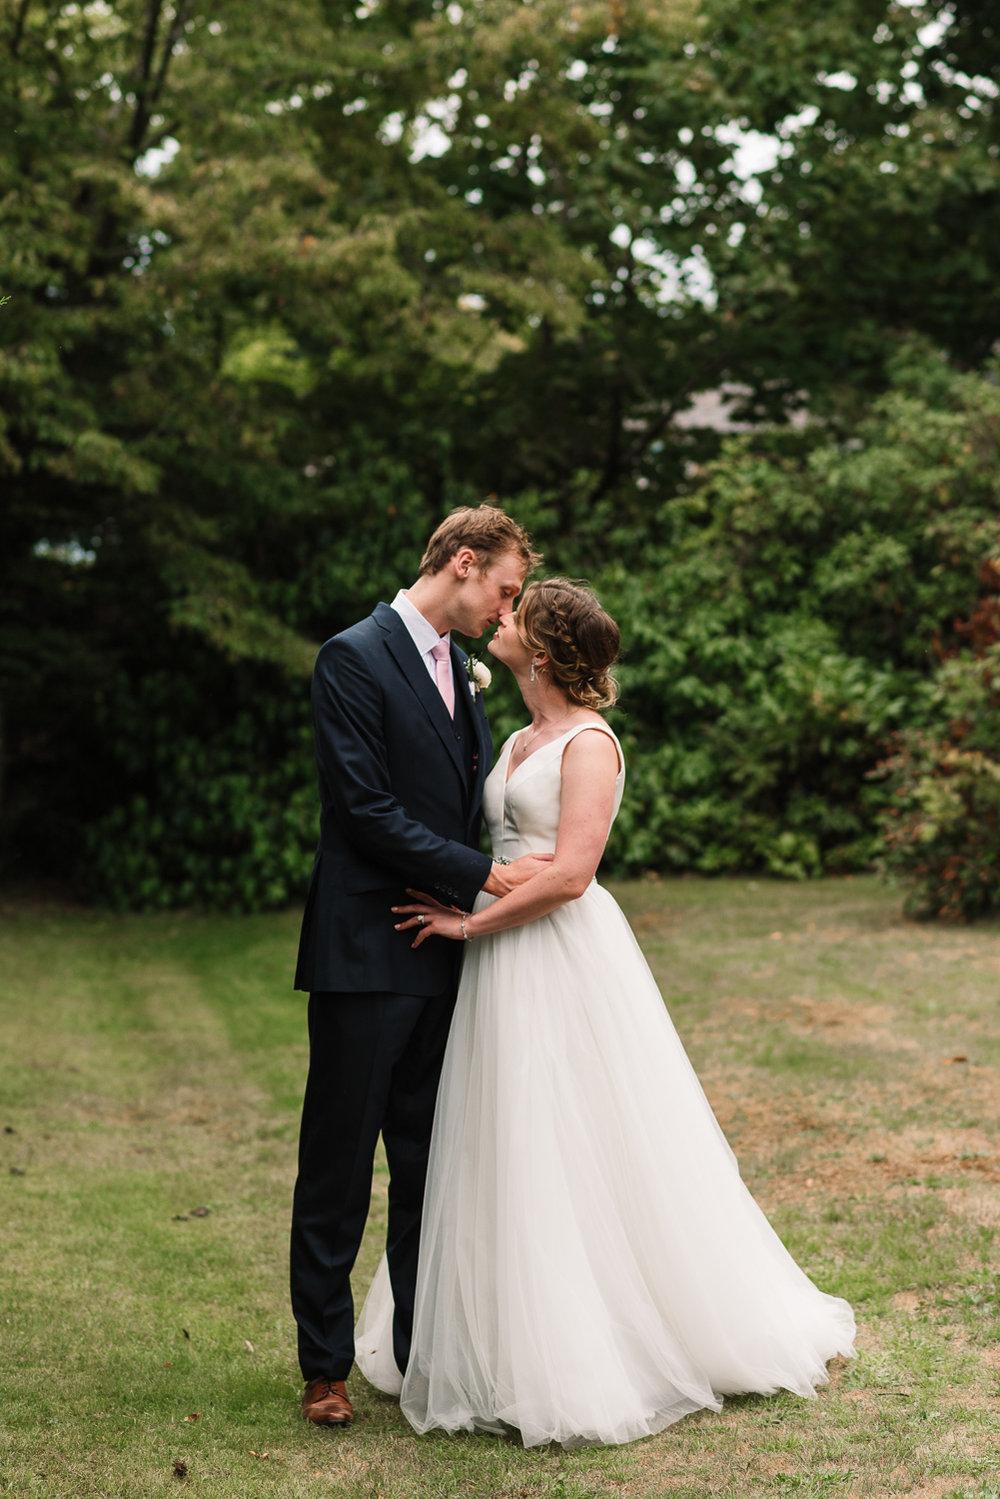 frensham-wedding-photographer-46.jpg